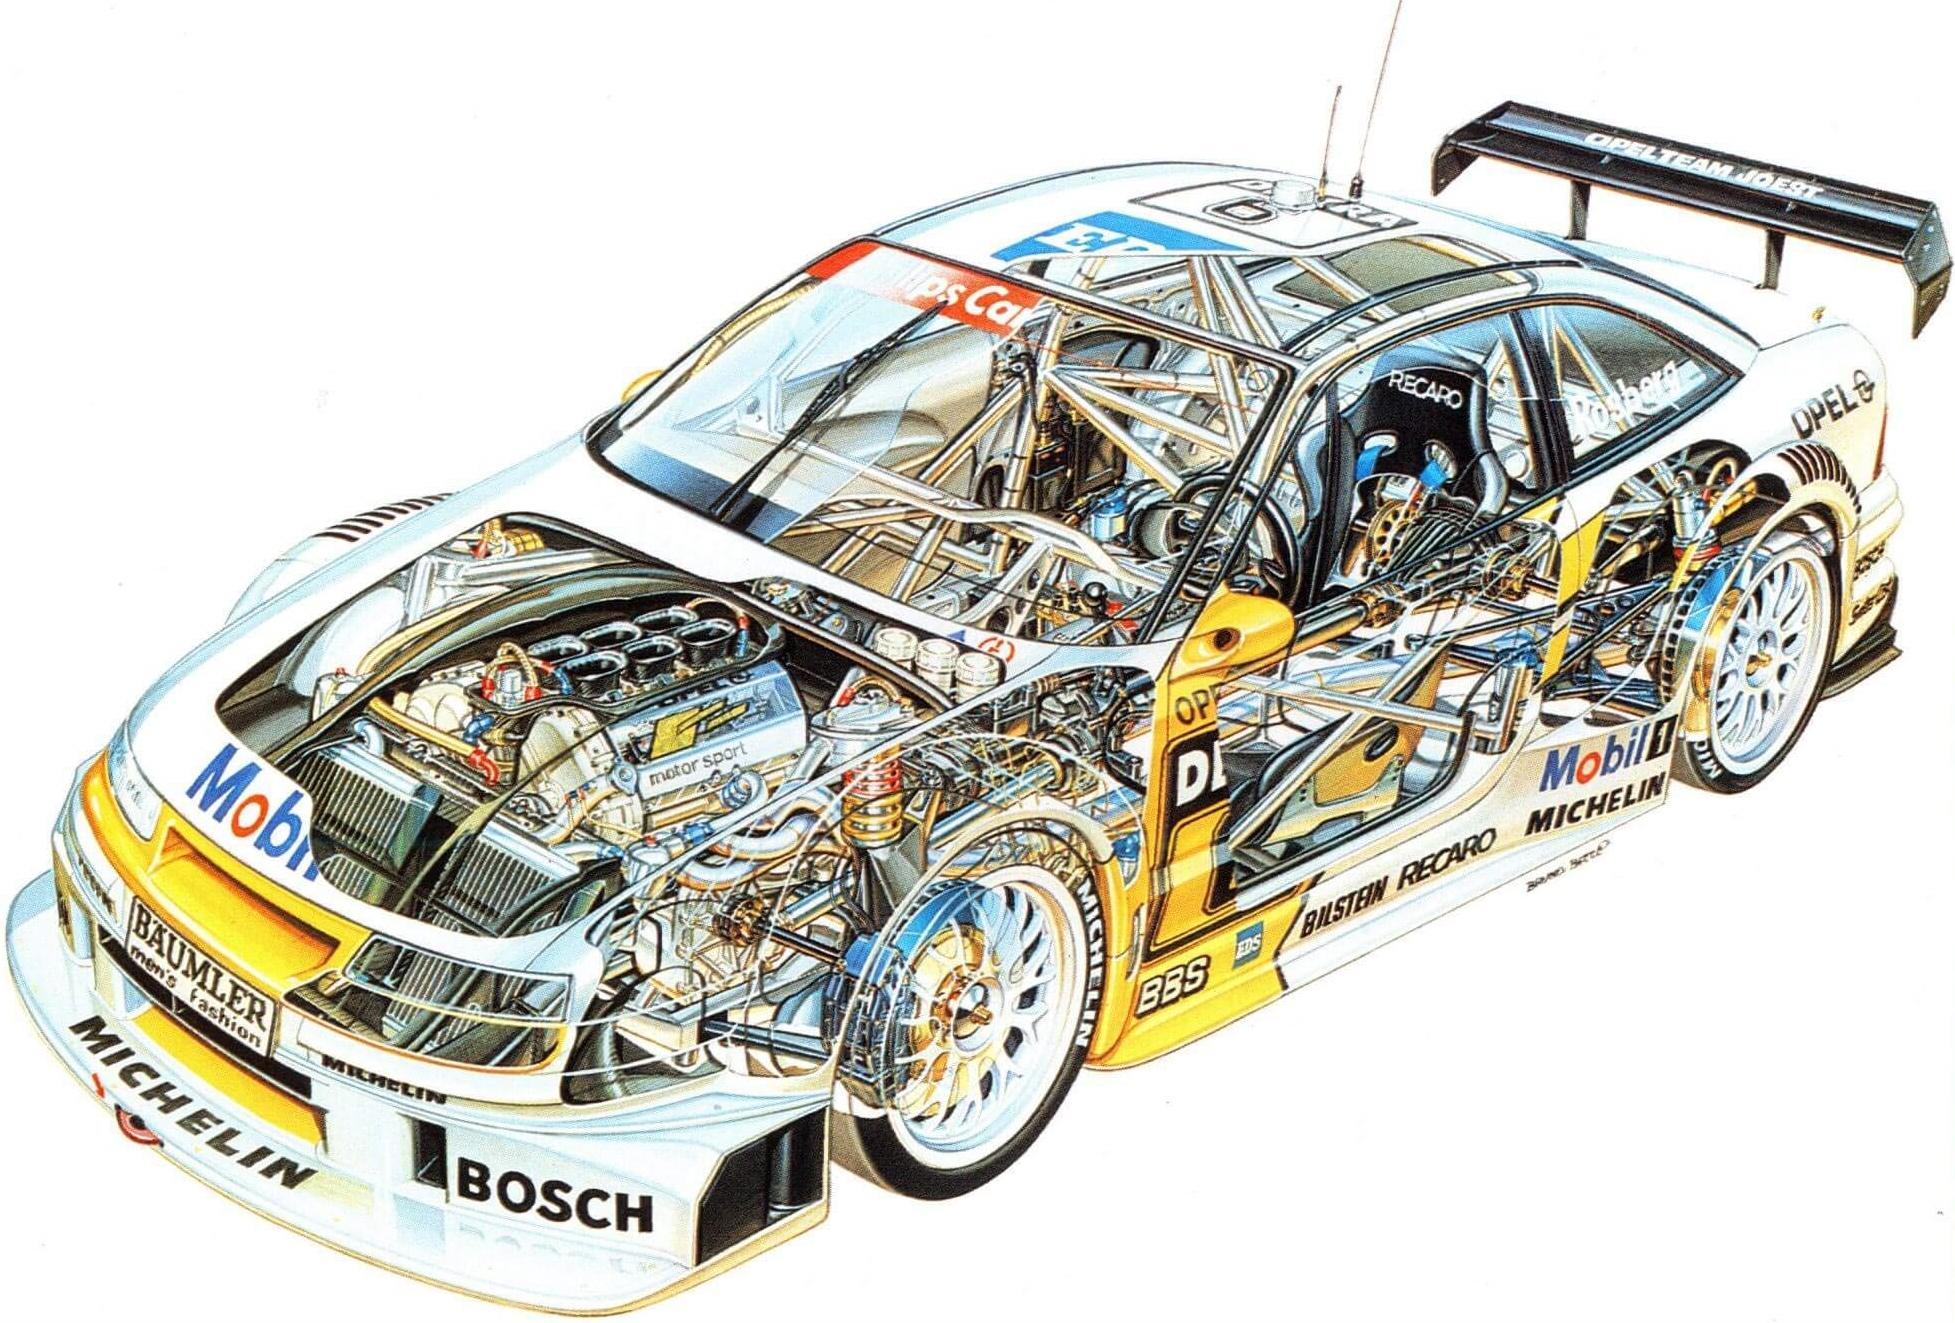 Opel Calibra V6 DTM Edition Sondermodell AUTODROM Moschokarfis